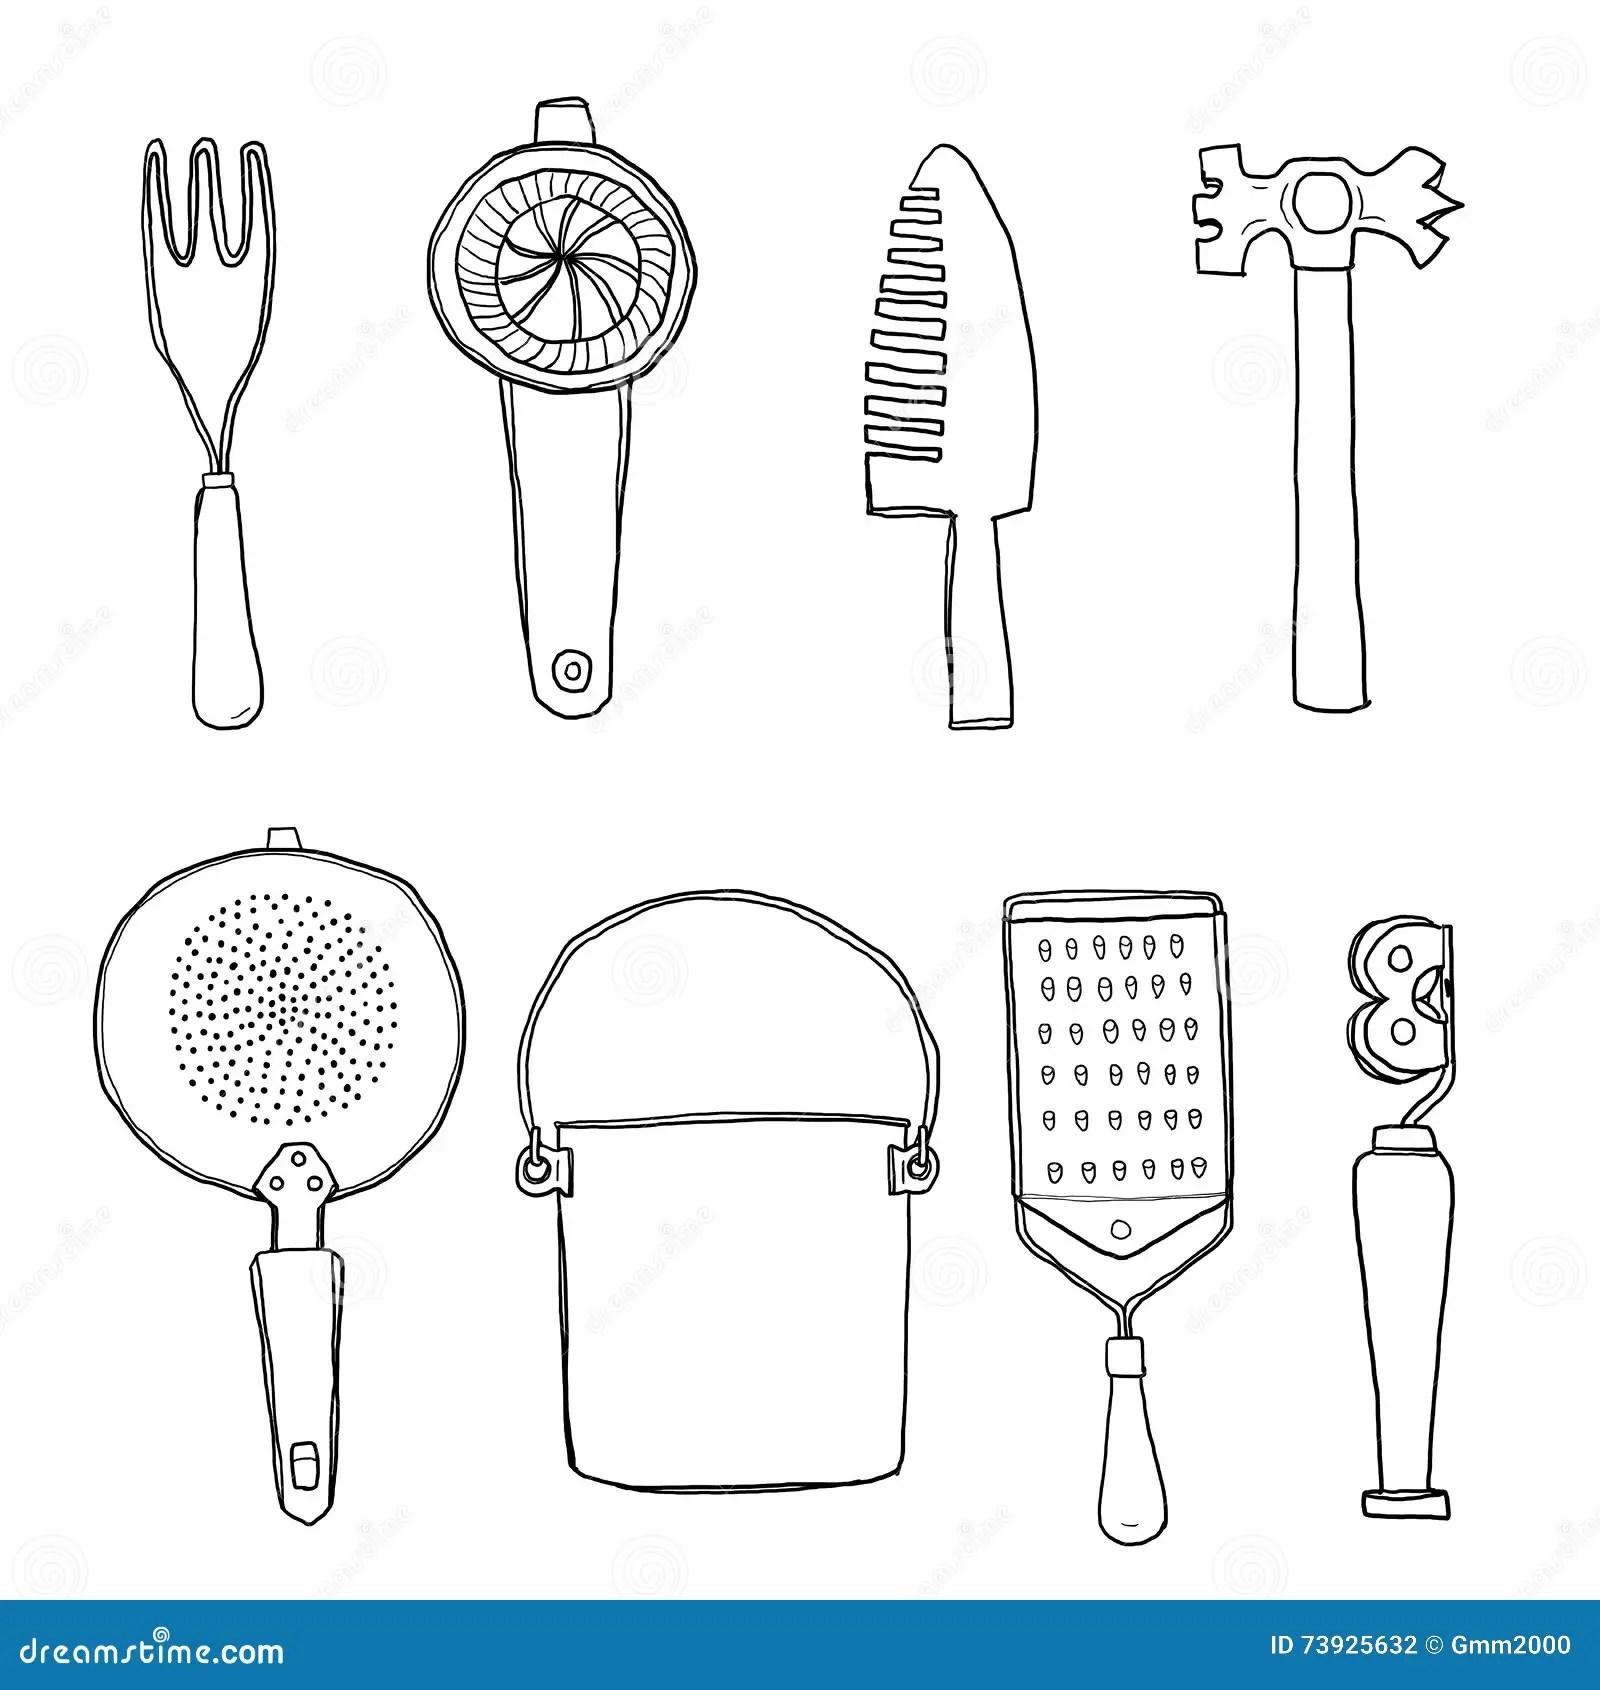 Vintage Kitchen Tools Hand Drawn Line Art Cute